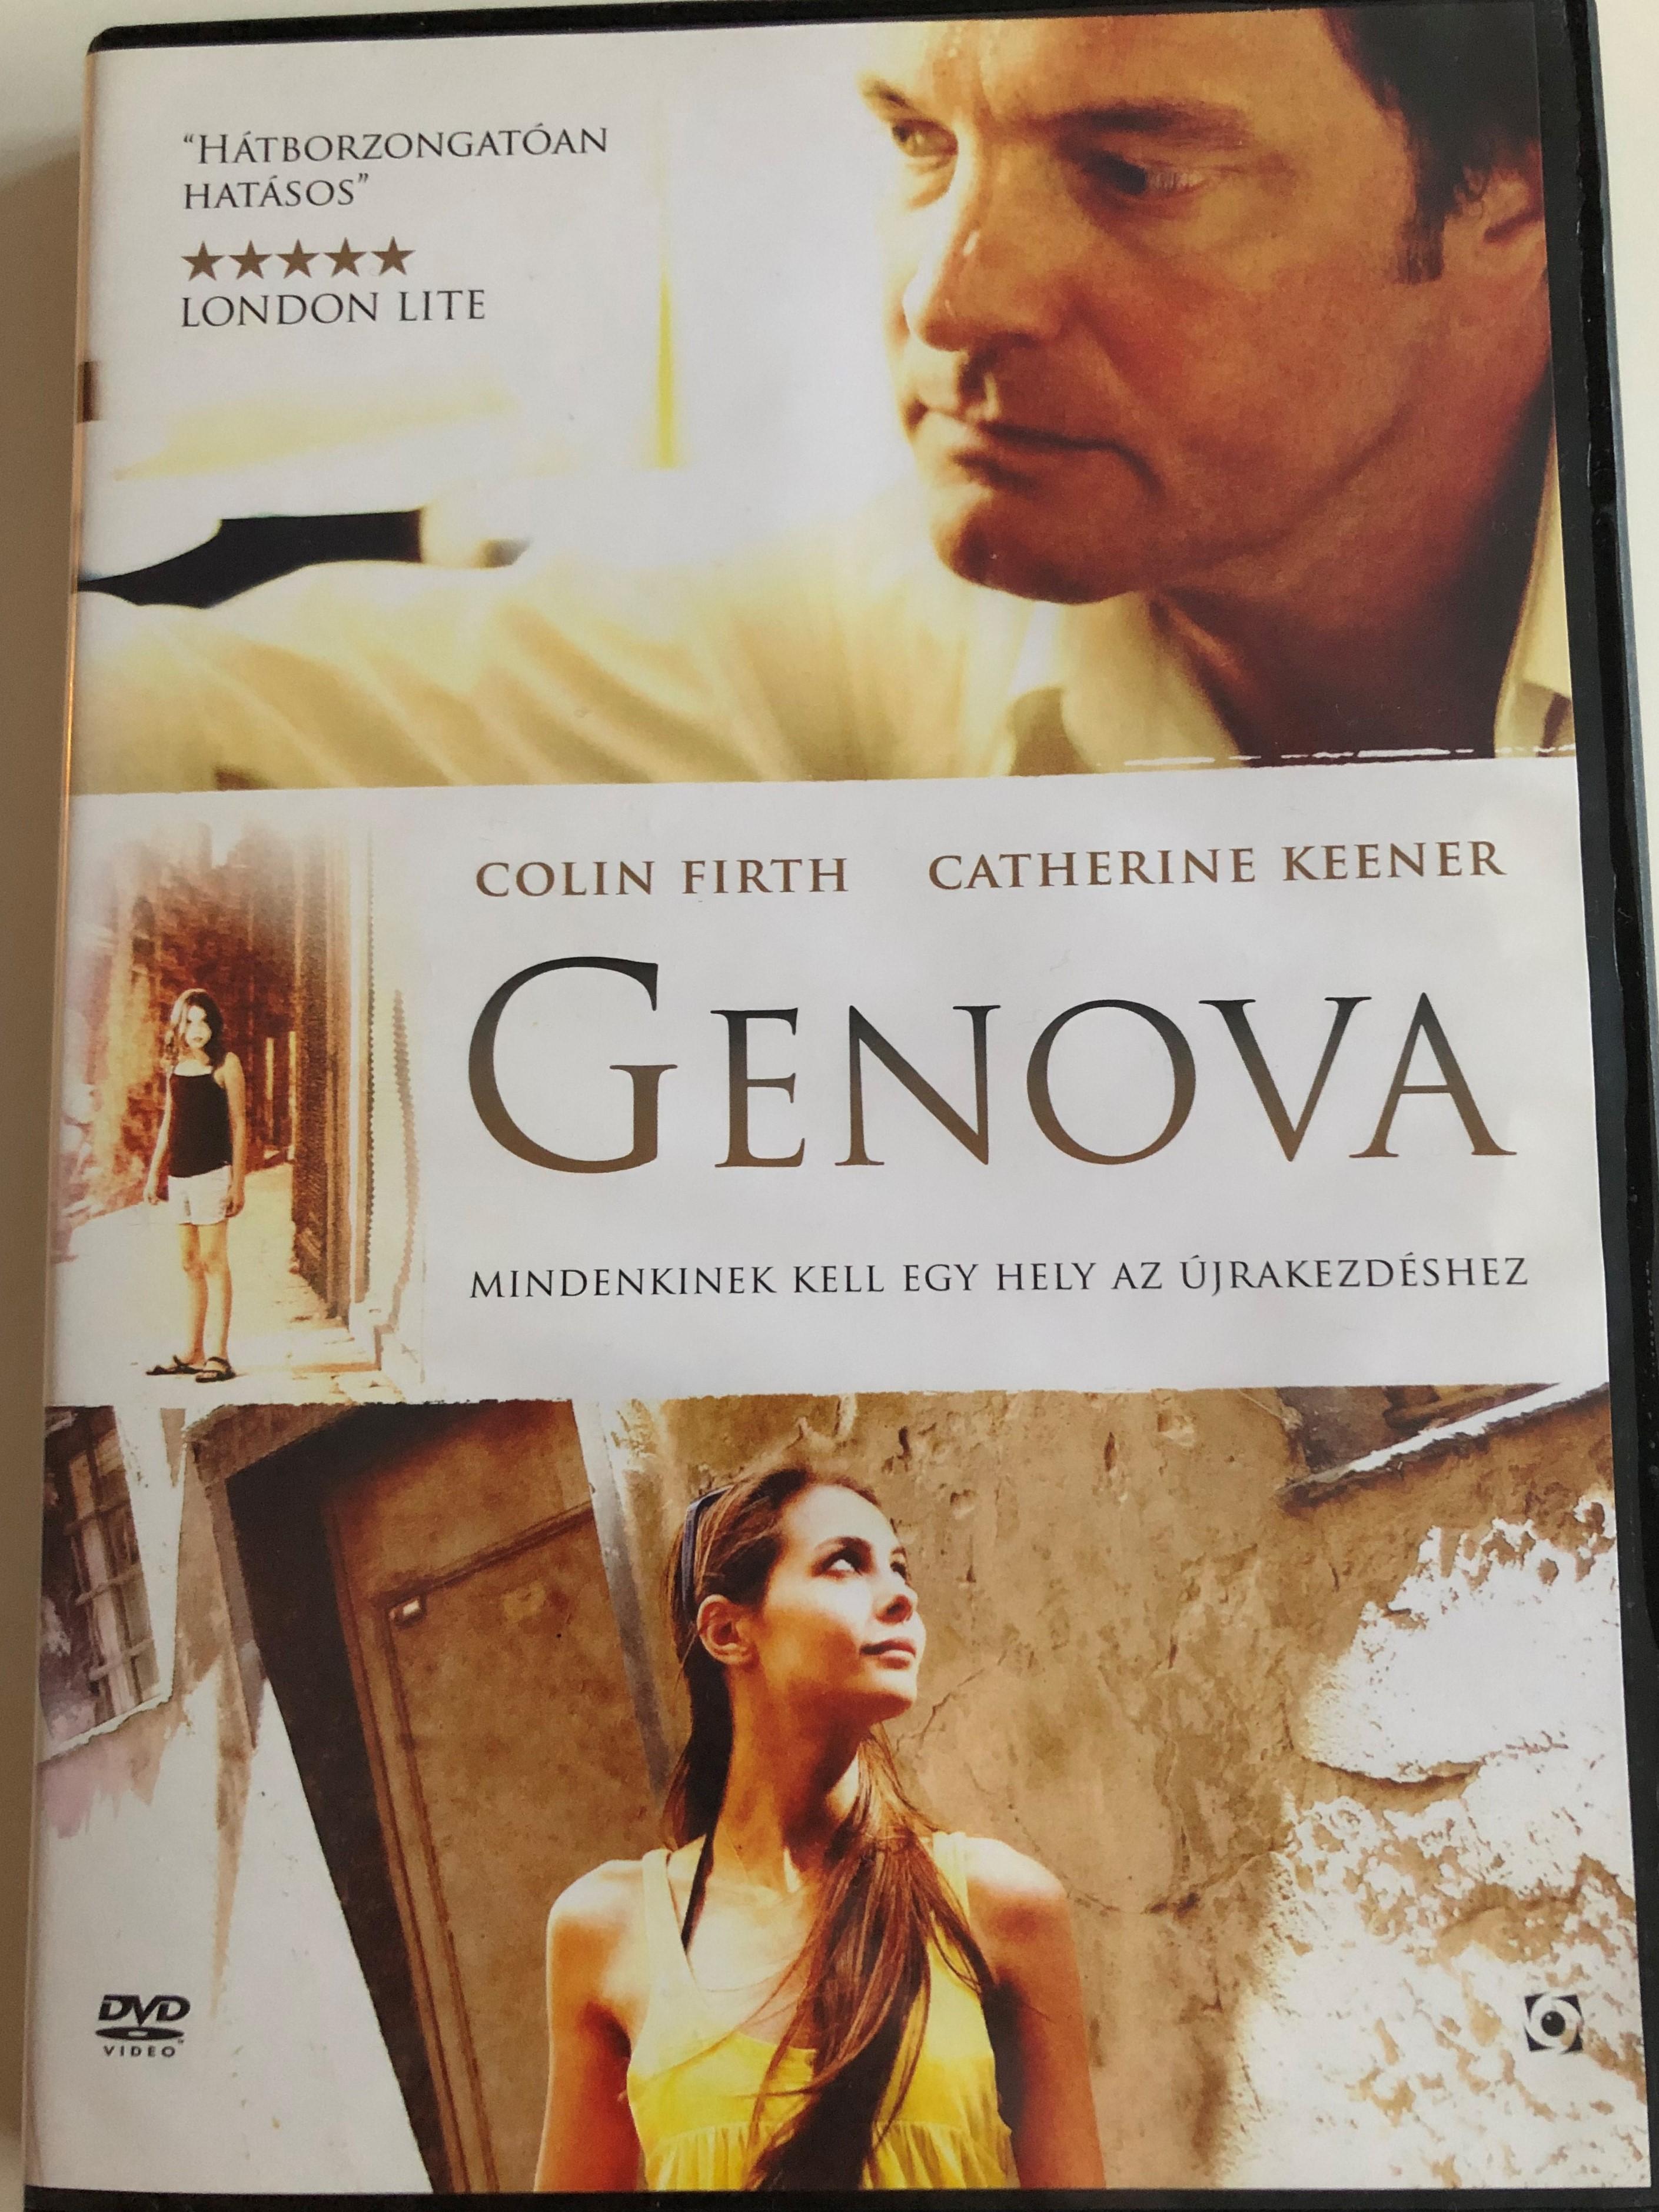 genova-dvd-2008-directed-by-michael-winterbottom-1.jpg